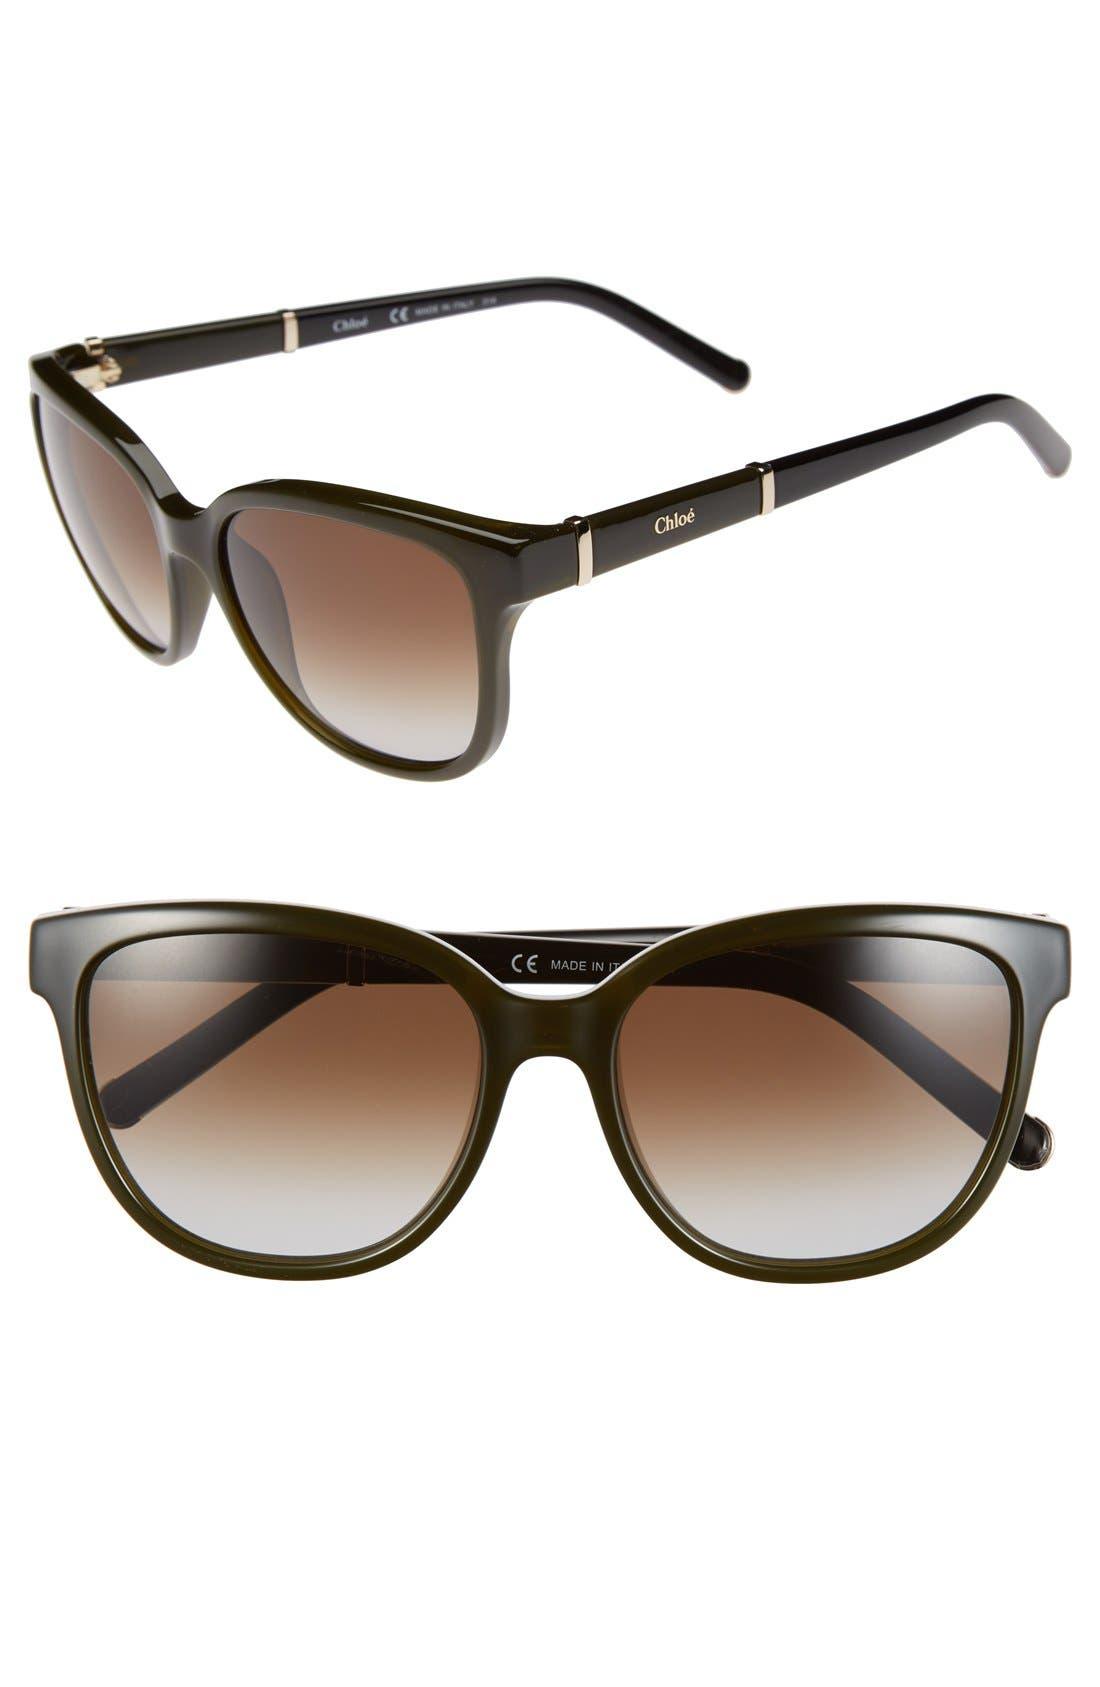 Alternate Image 1 Selected - Chloé 'Daisy' 54mm Sunglasses